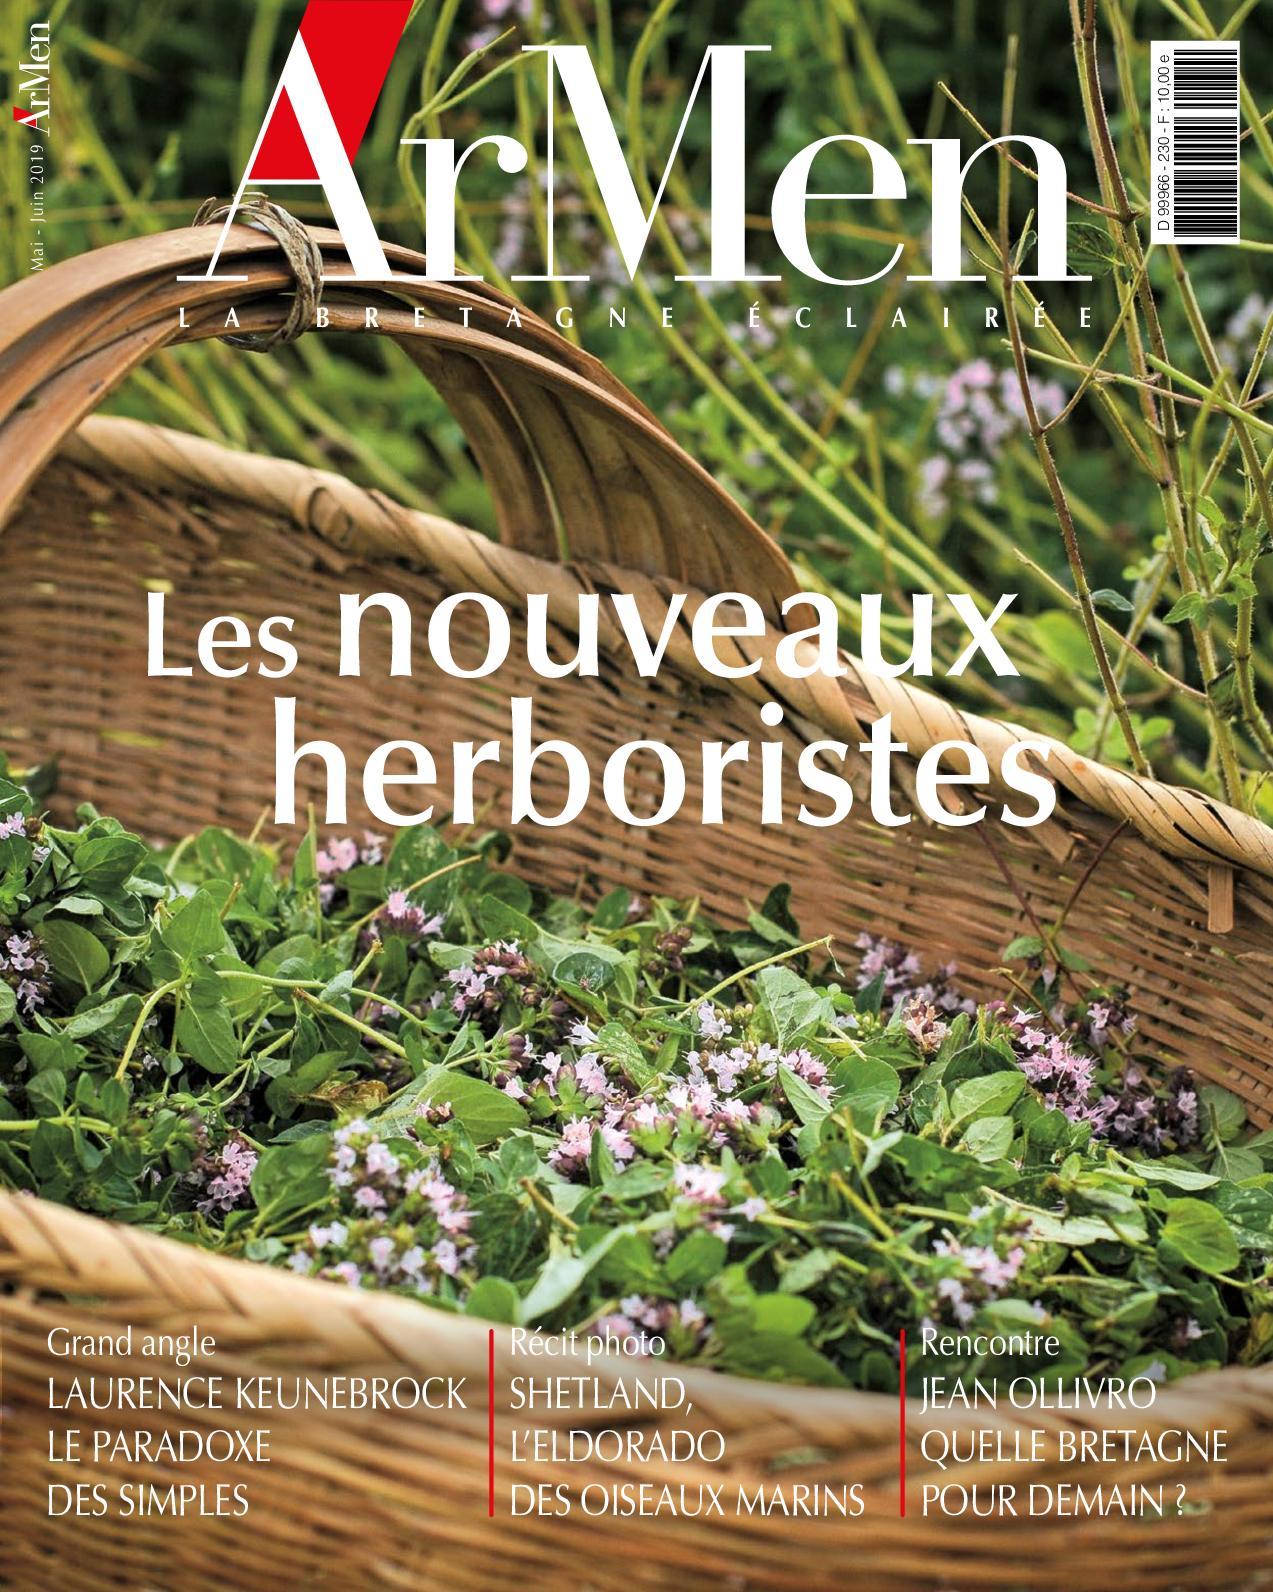 Anais Jeanneret Photo Lui calaméo - armen n°230 - mai / juin 2019